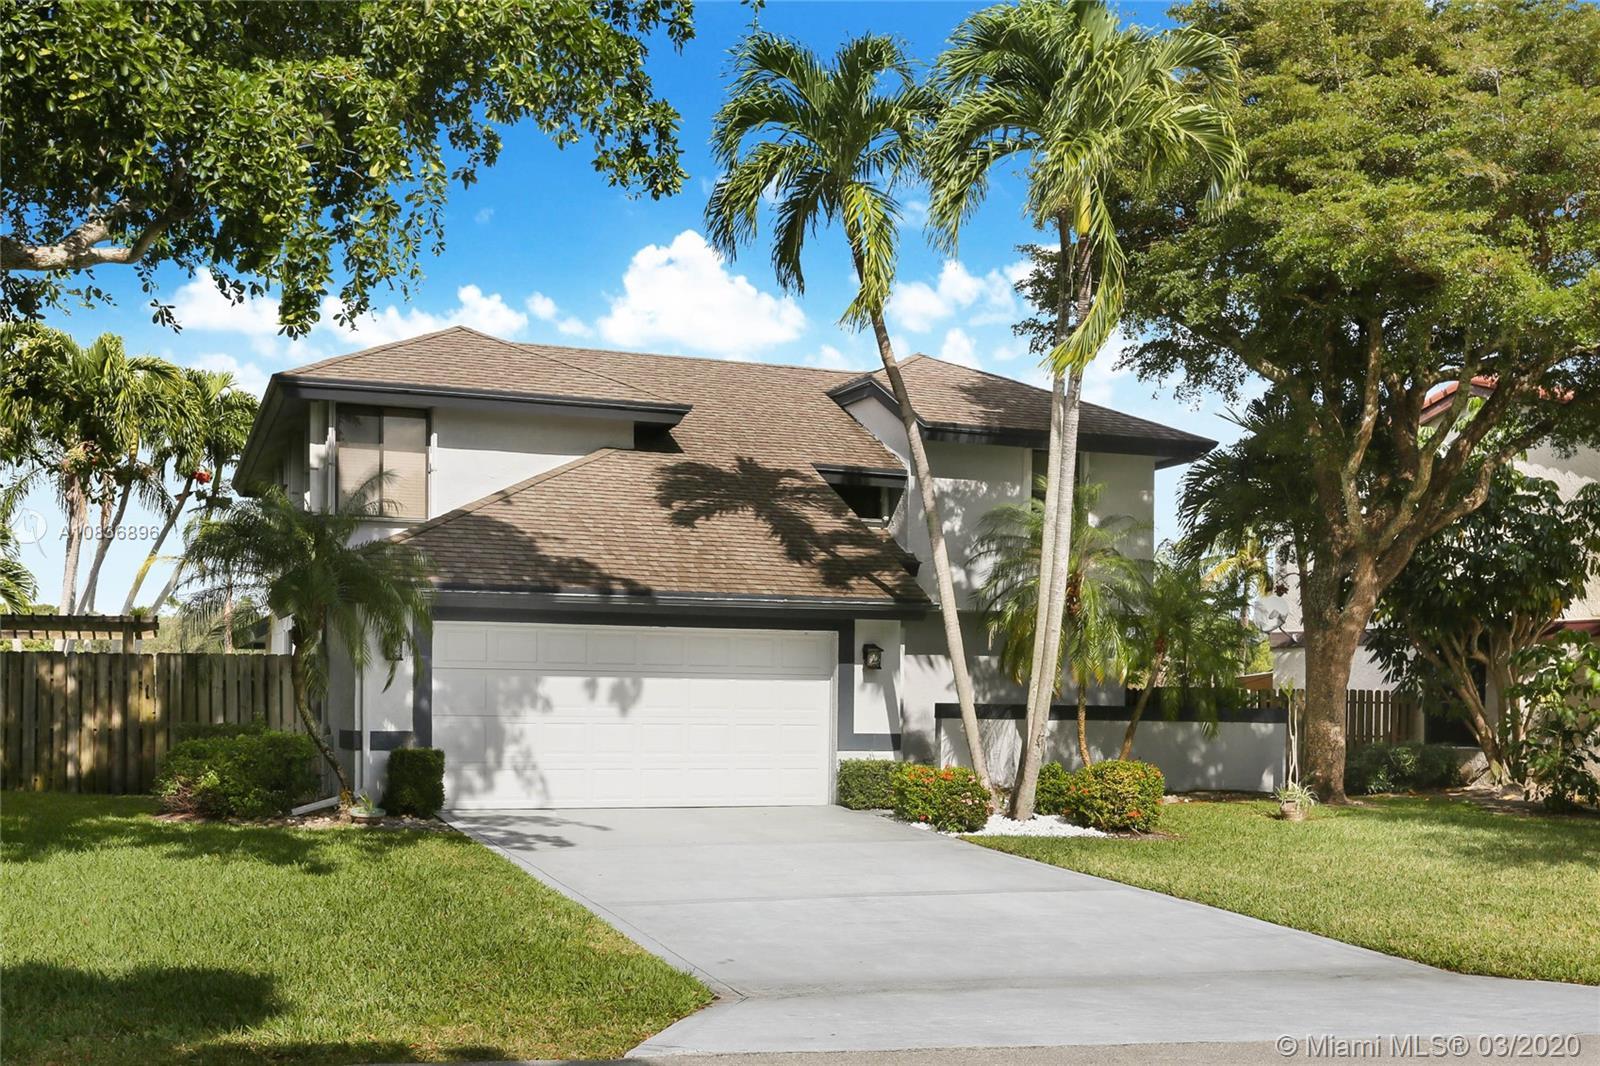 6547 Sweet Maple Ln, Boca Raton, FL 33433